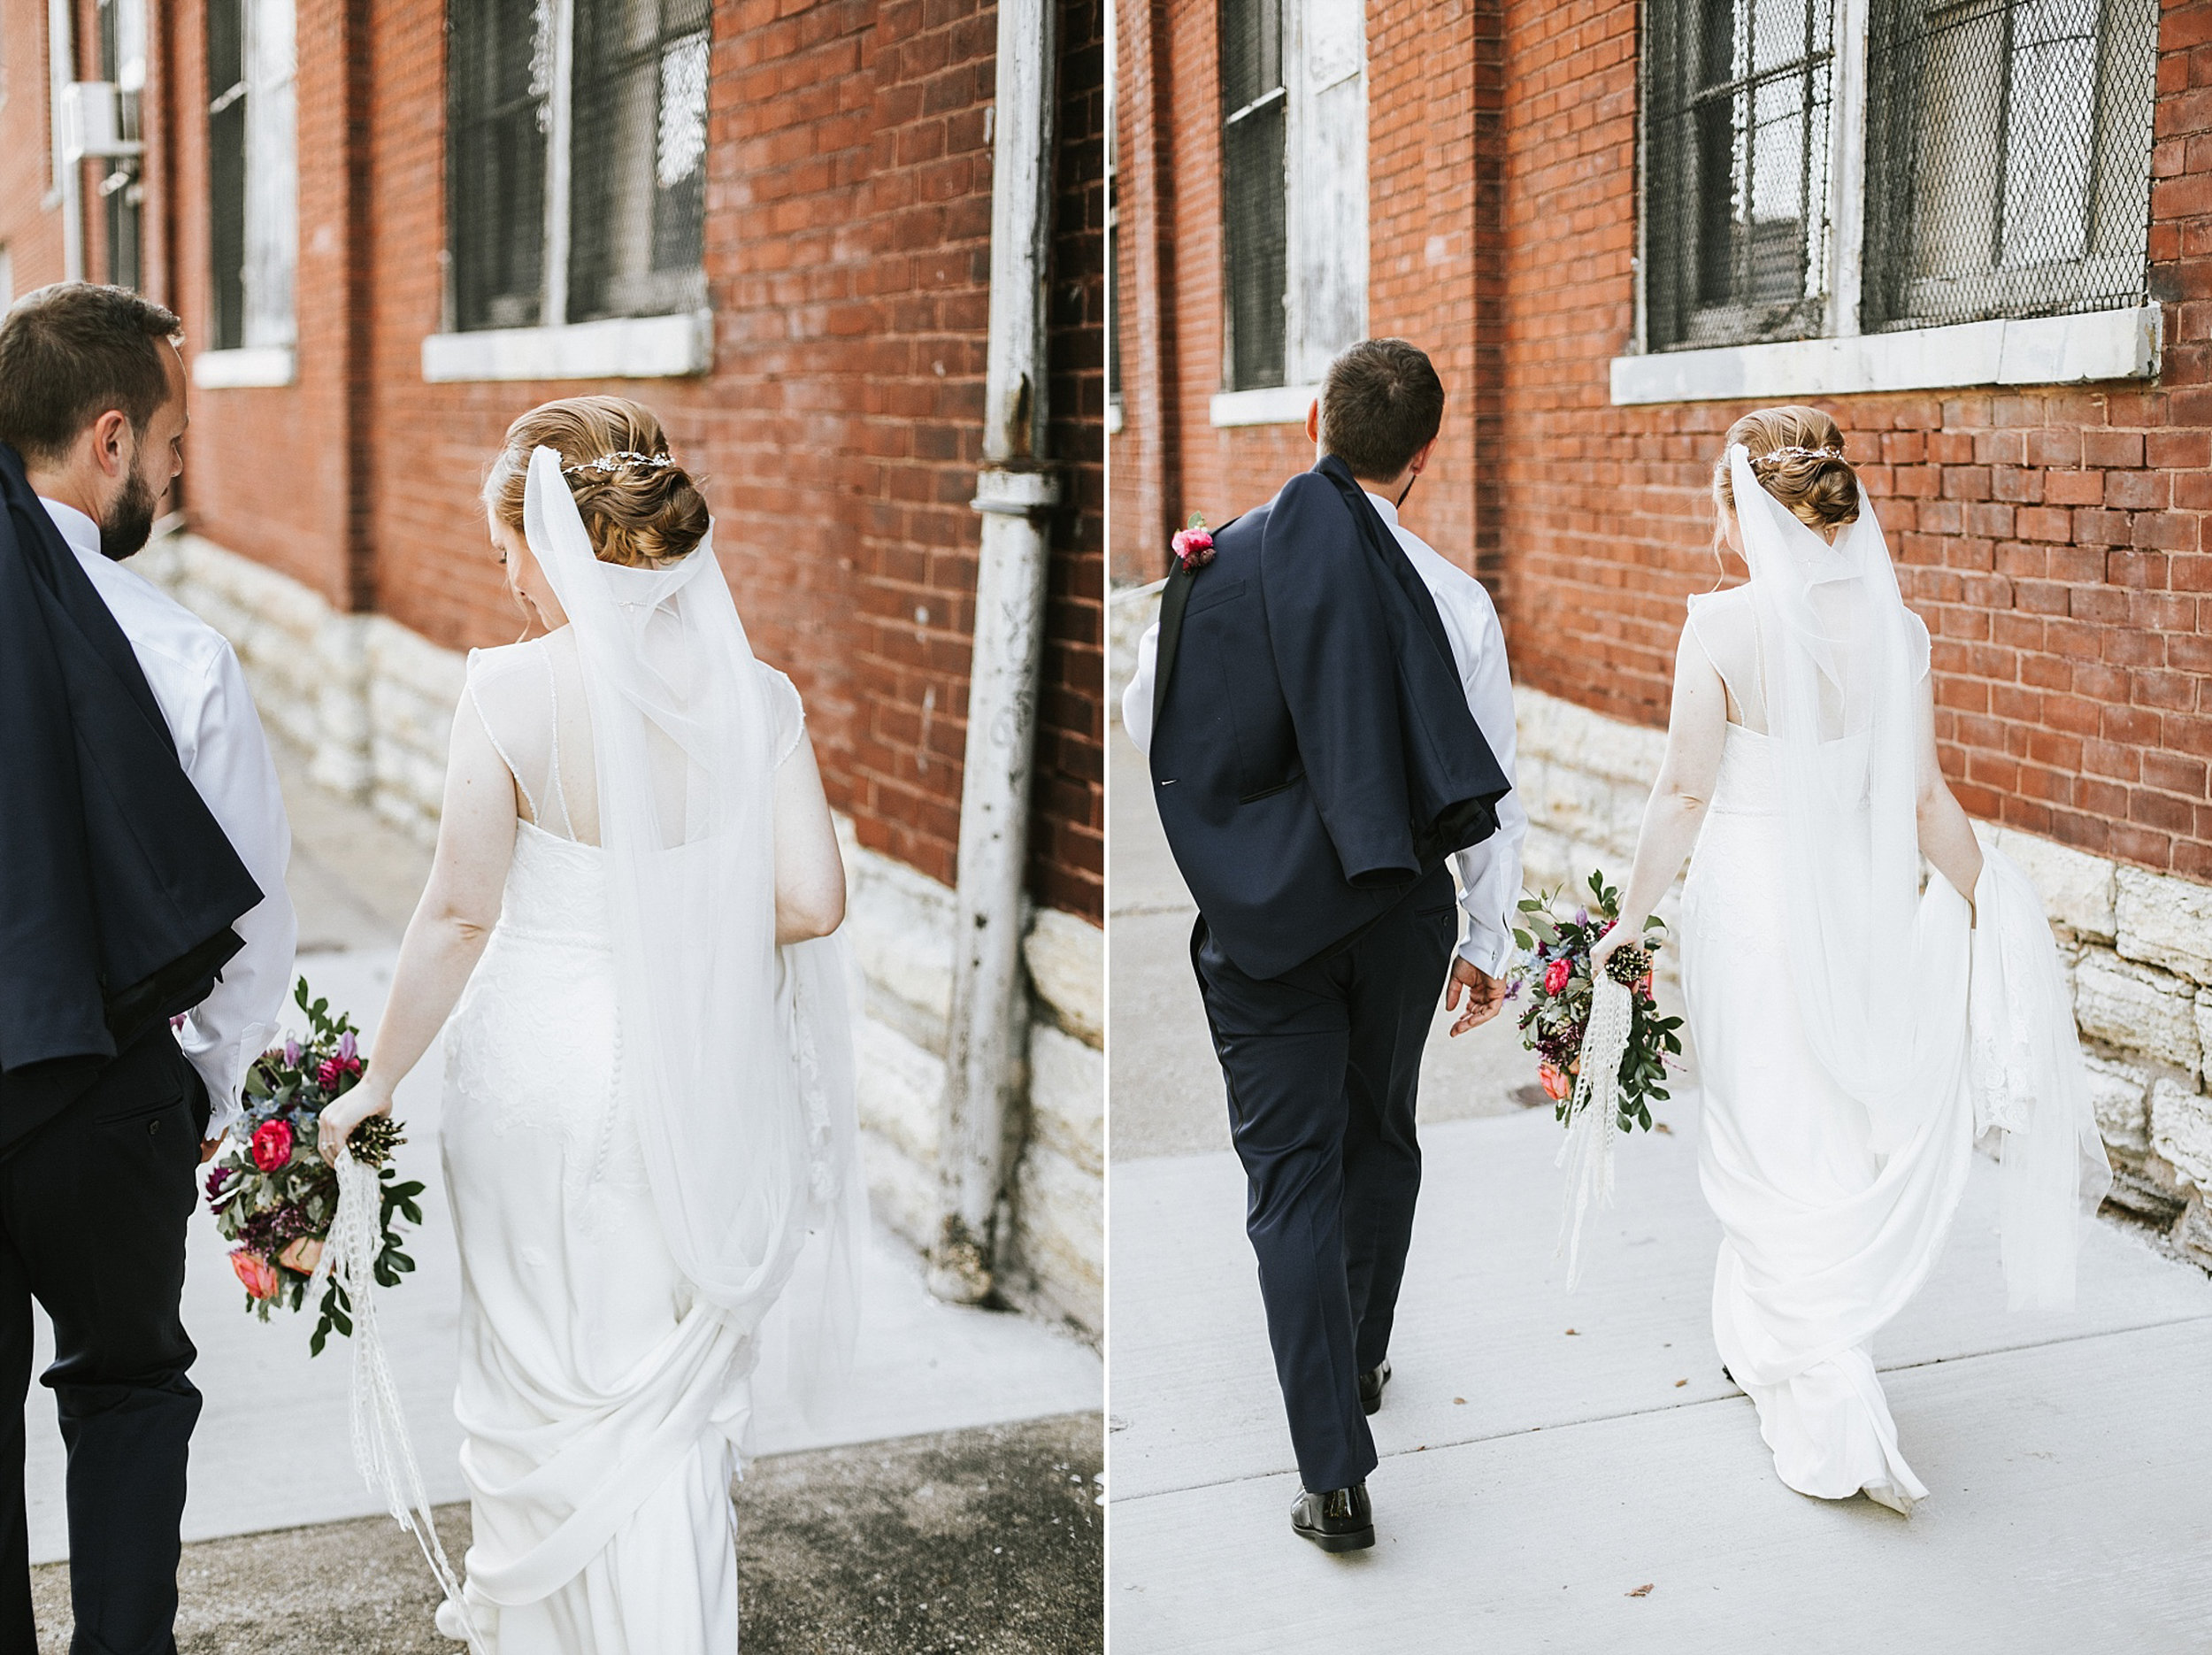 Brooke Townsend Photography - Ohio Wedding Photographer-175.jpg